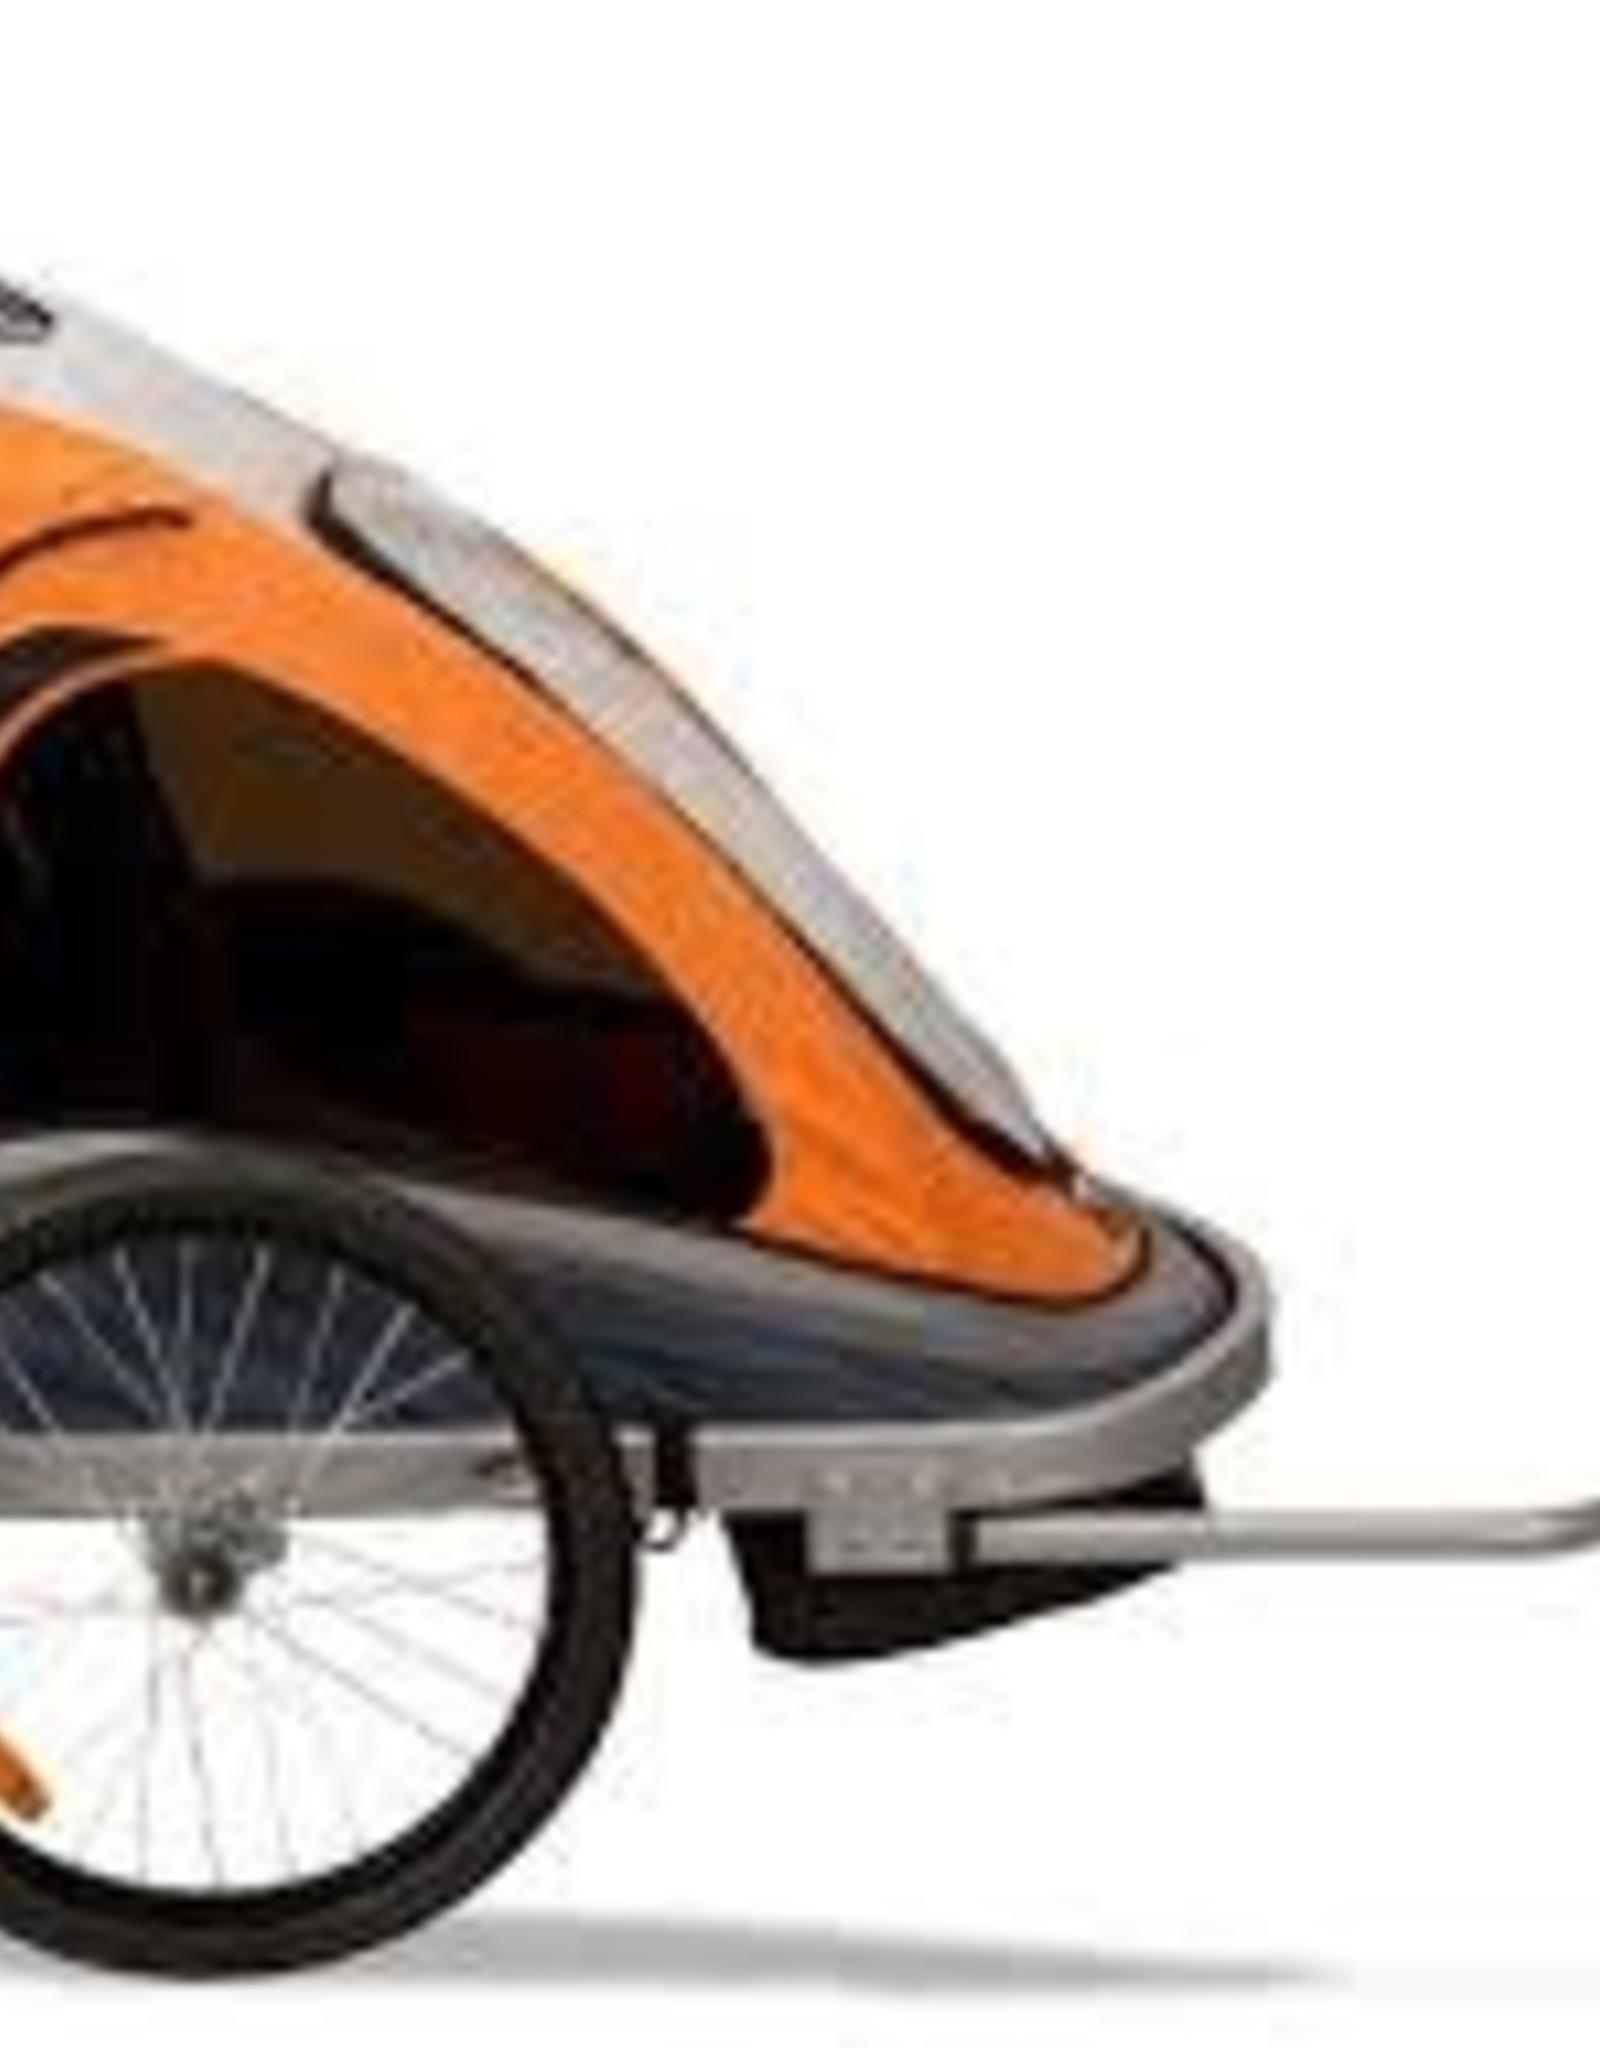 Via Velo Via Velo Montalban Bike Trailer with Jogger Kit